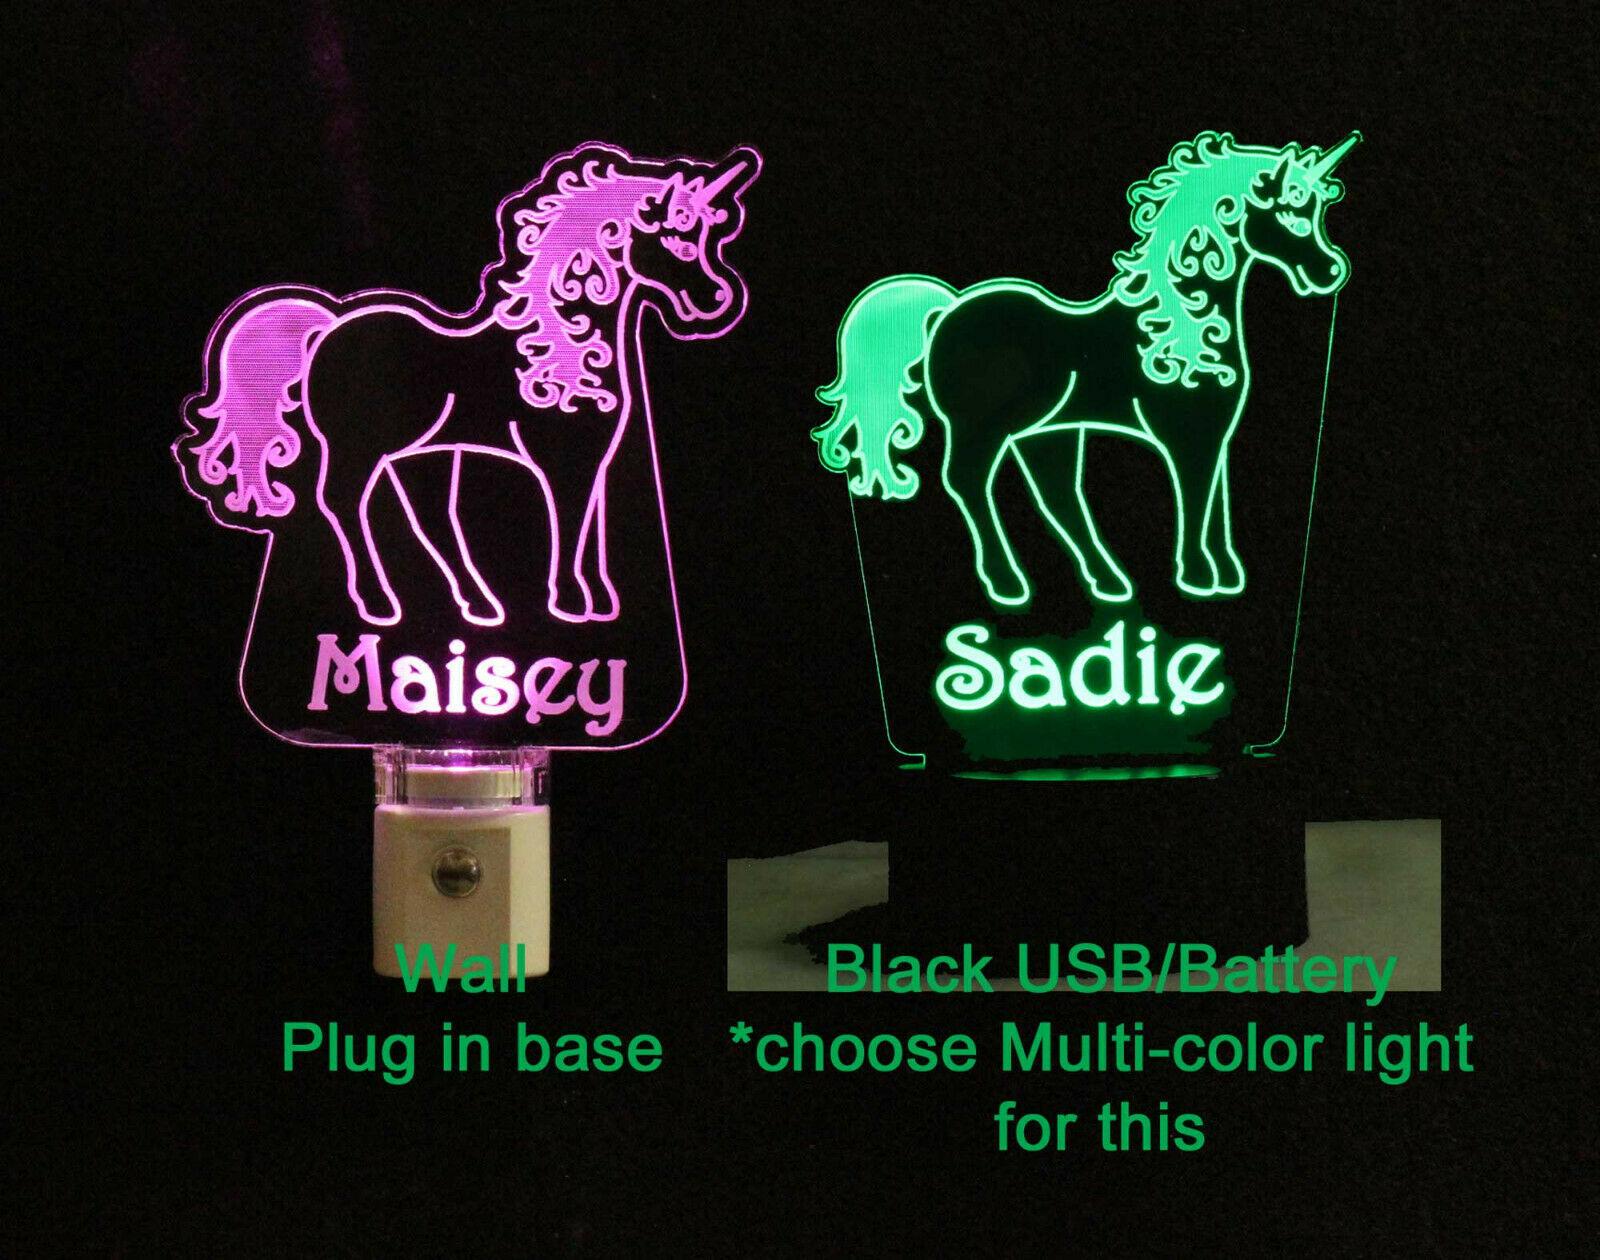 Personalized Unicorn Lamp Night light USB or Wall Plug In